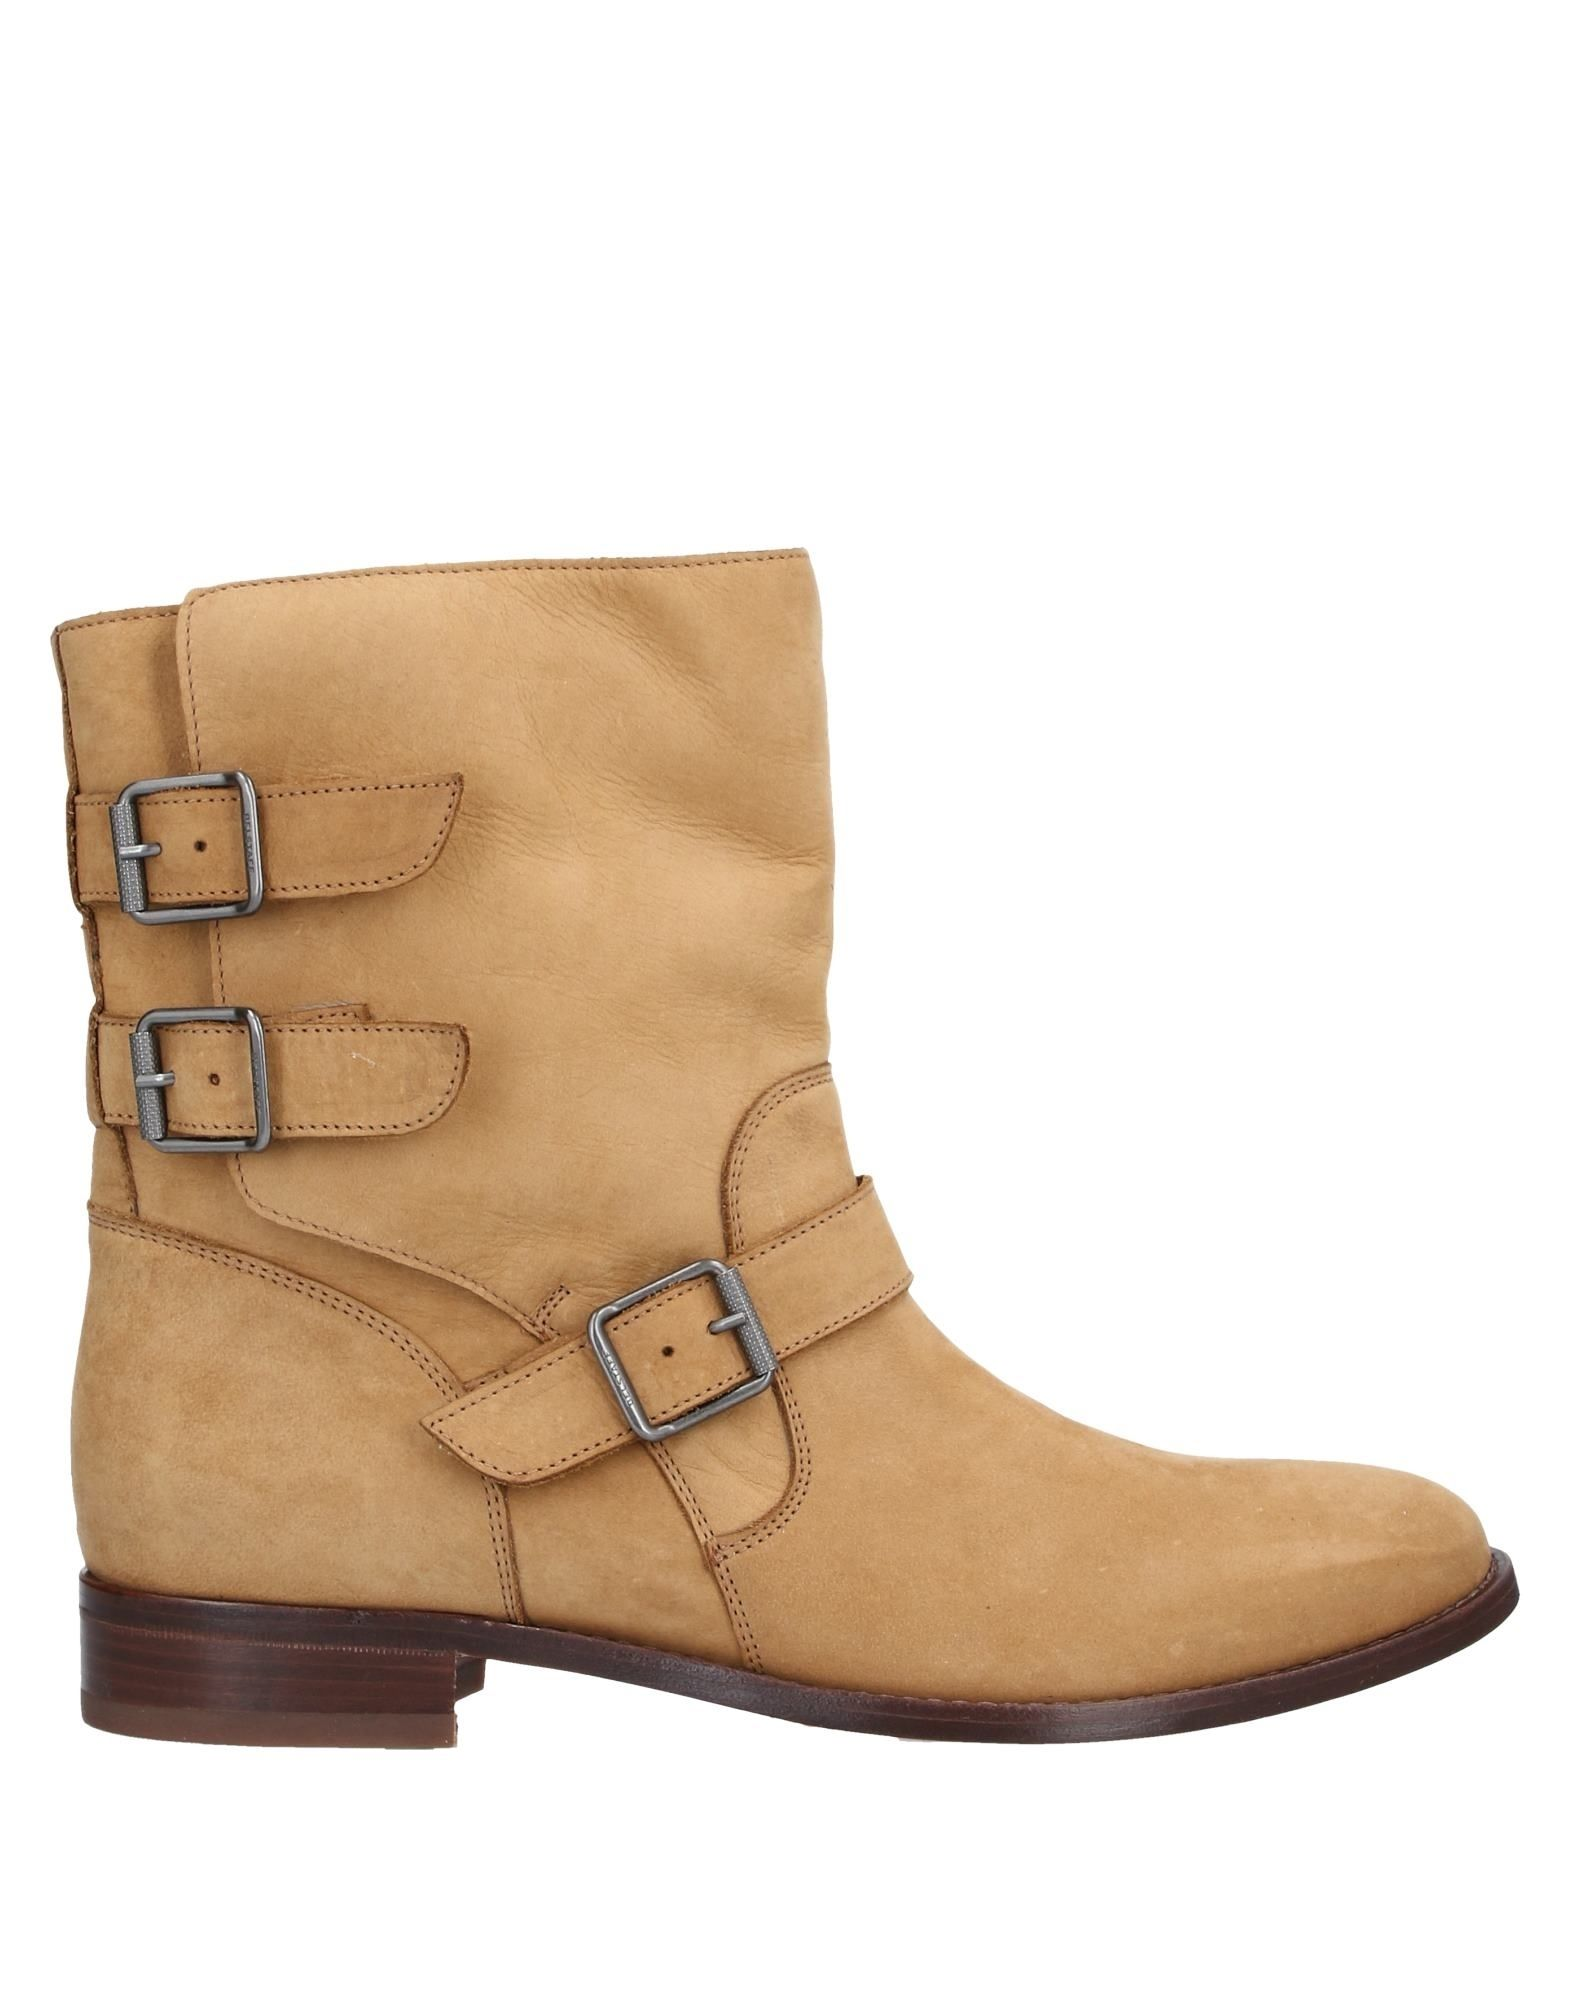 Belstaff Ankle Boot - Women Belstaff Ankle Boots online on 11503032ED  Canada - 11503032ED on b5fddd